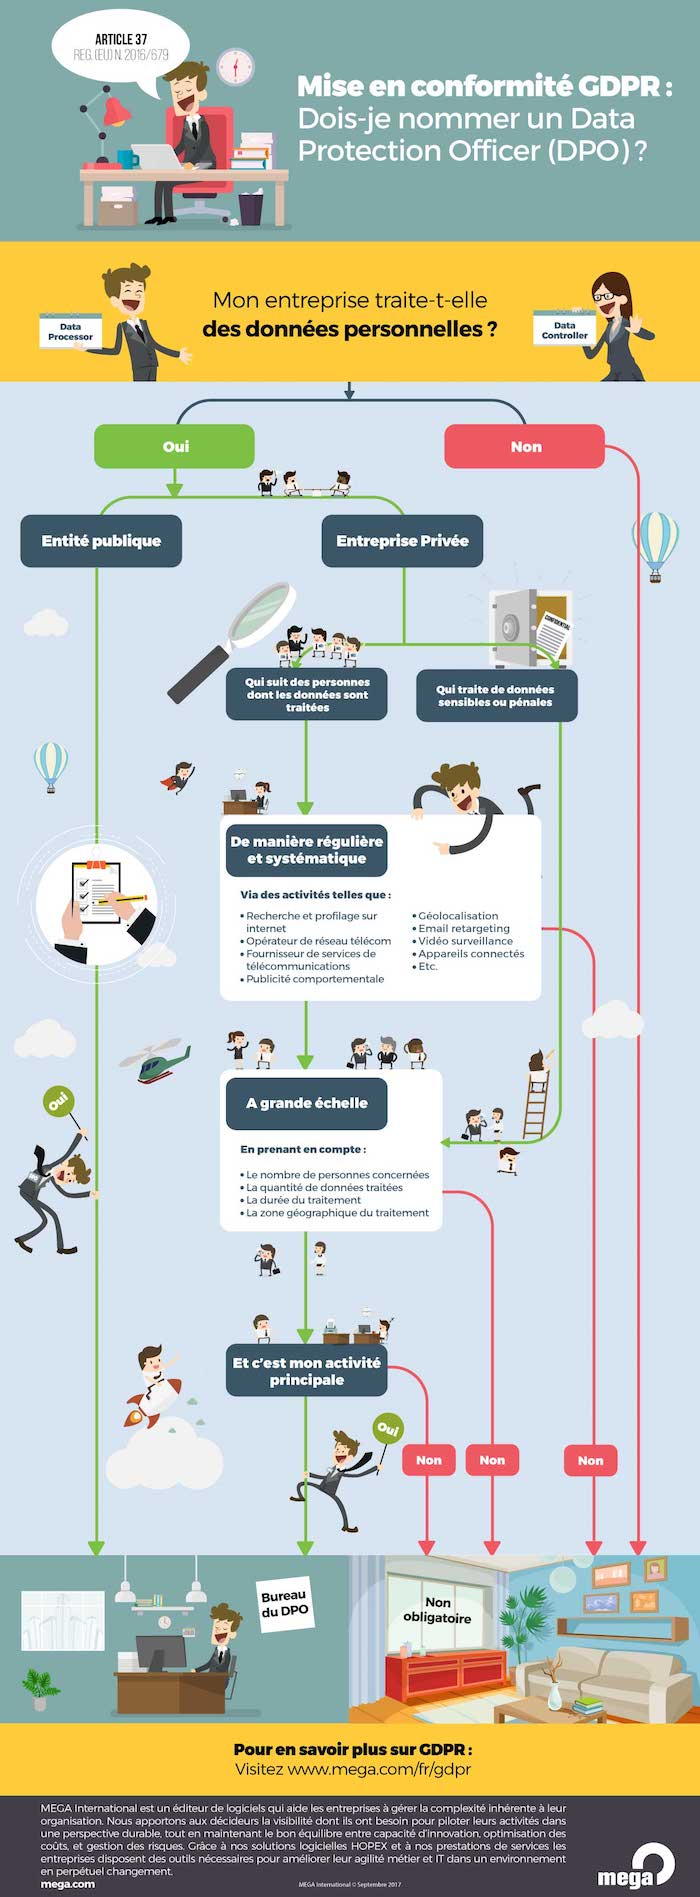 Conformite GDPR - DPO Infographie